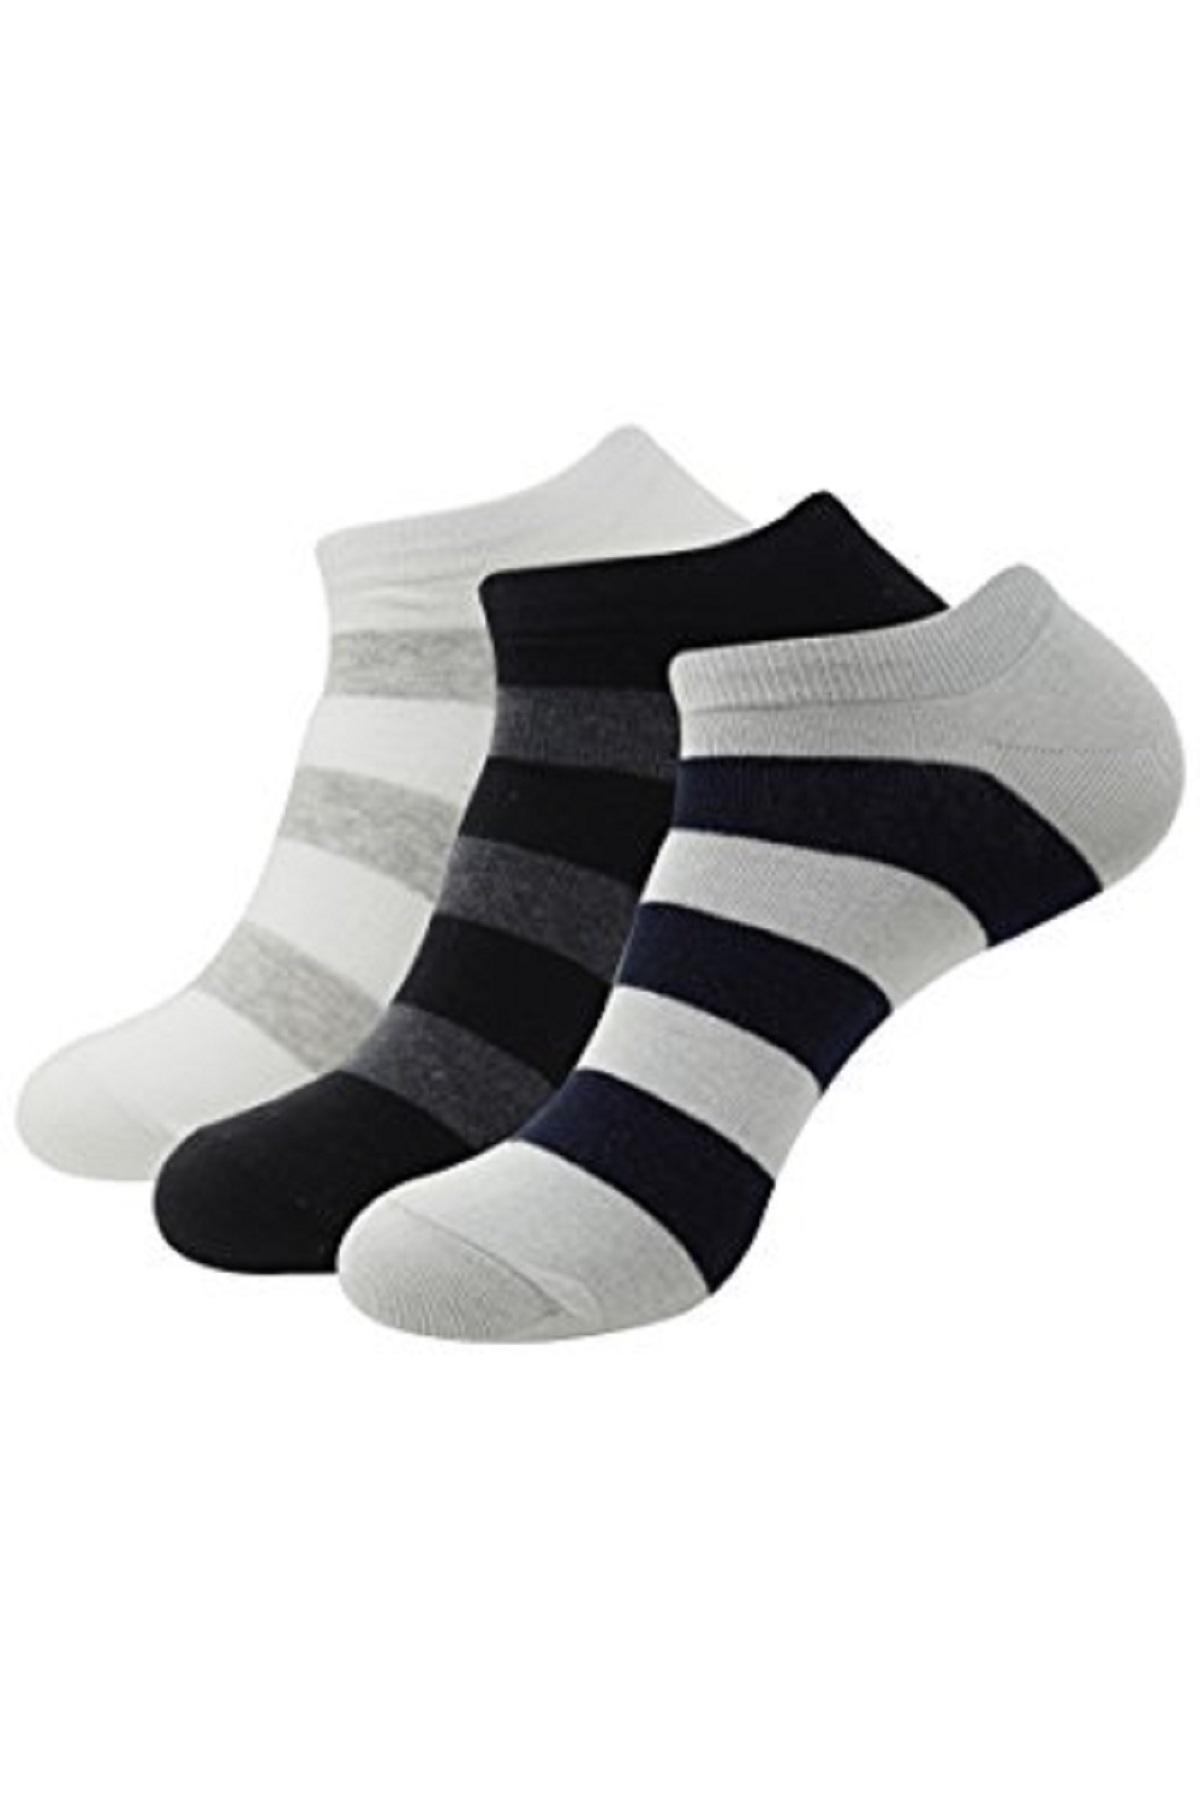 Balenzia Men's Ru gby Stripe Low Cut Socks  Pack of 3   Black, L.Grey, White